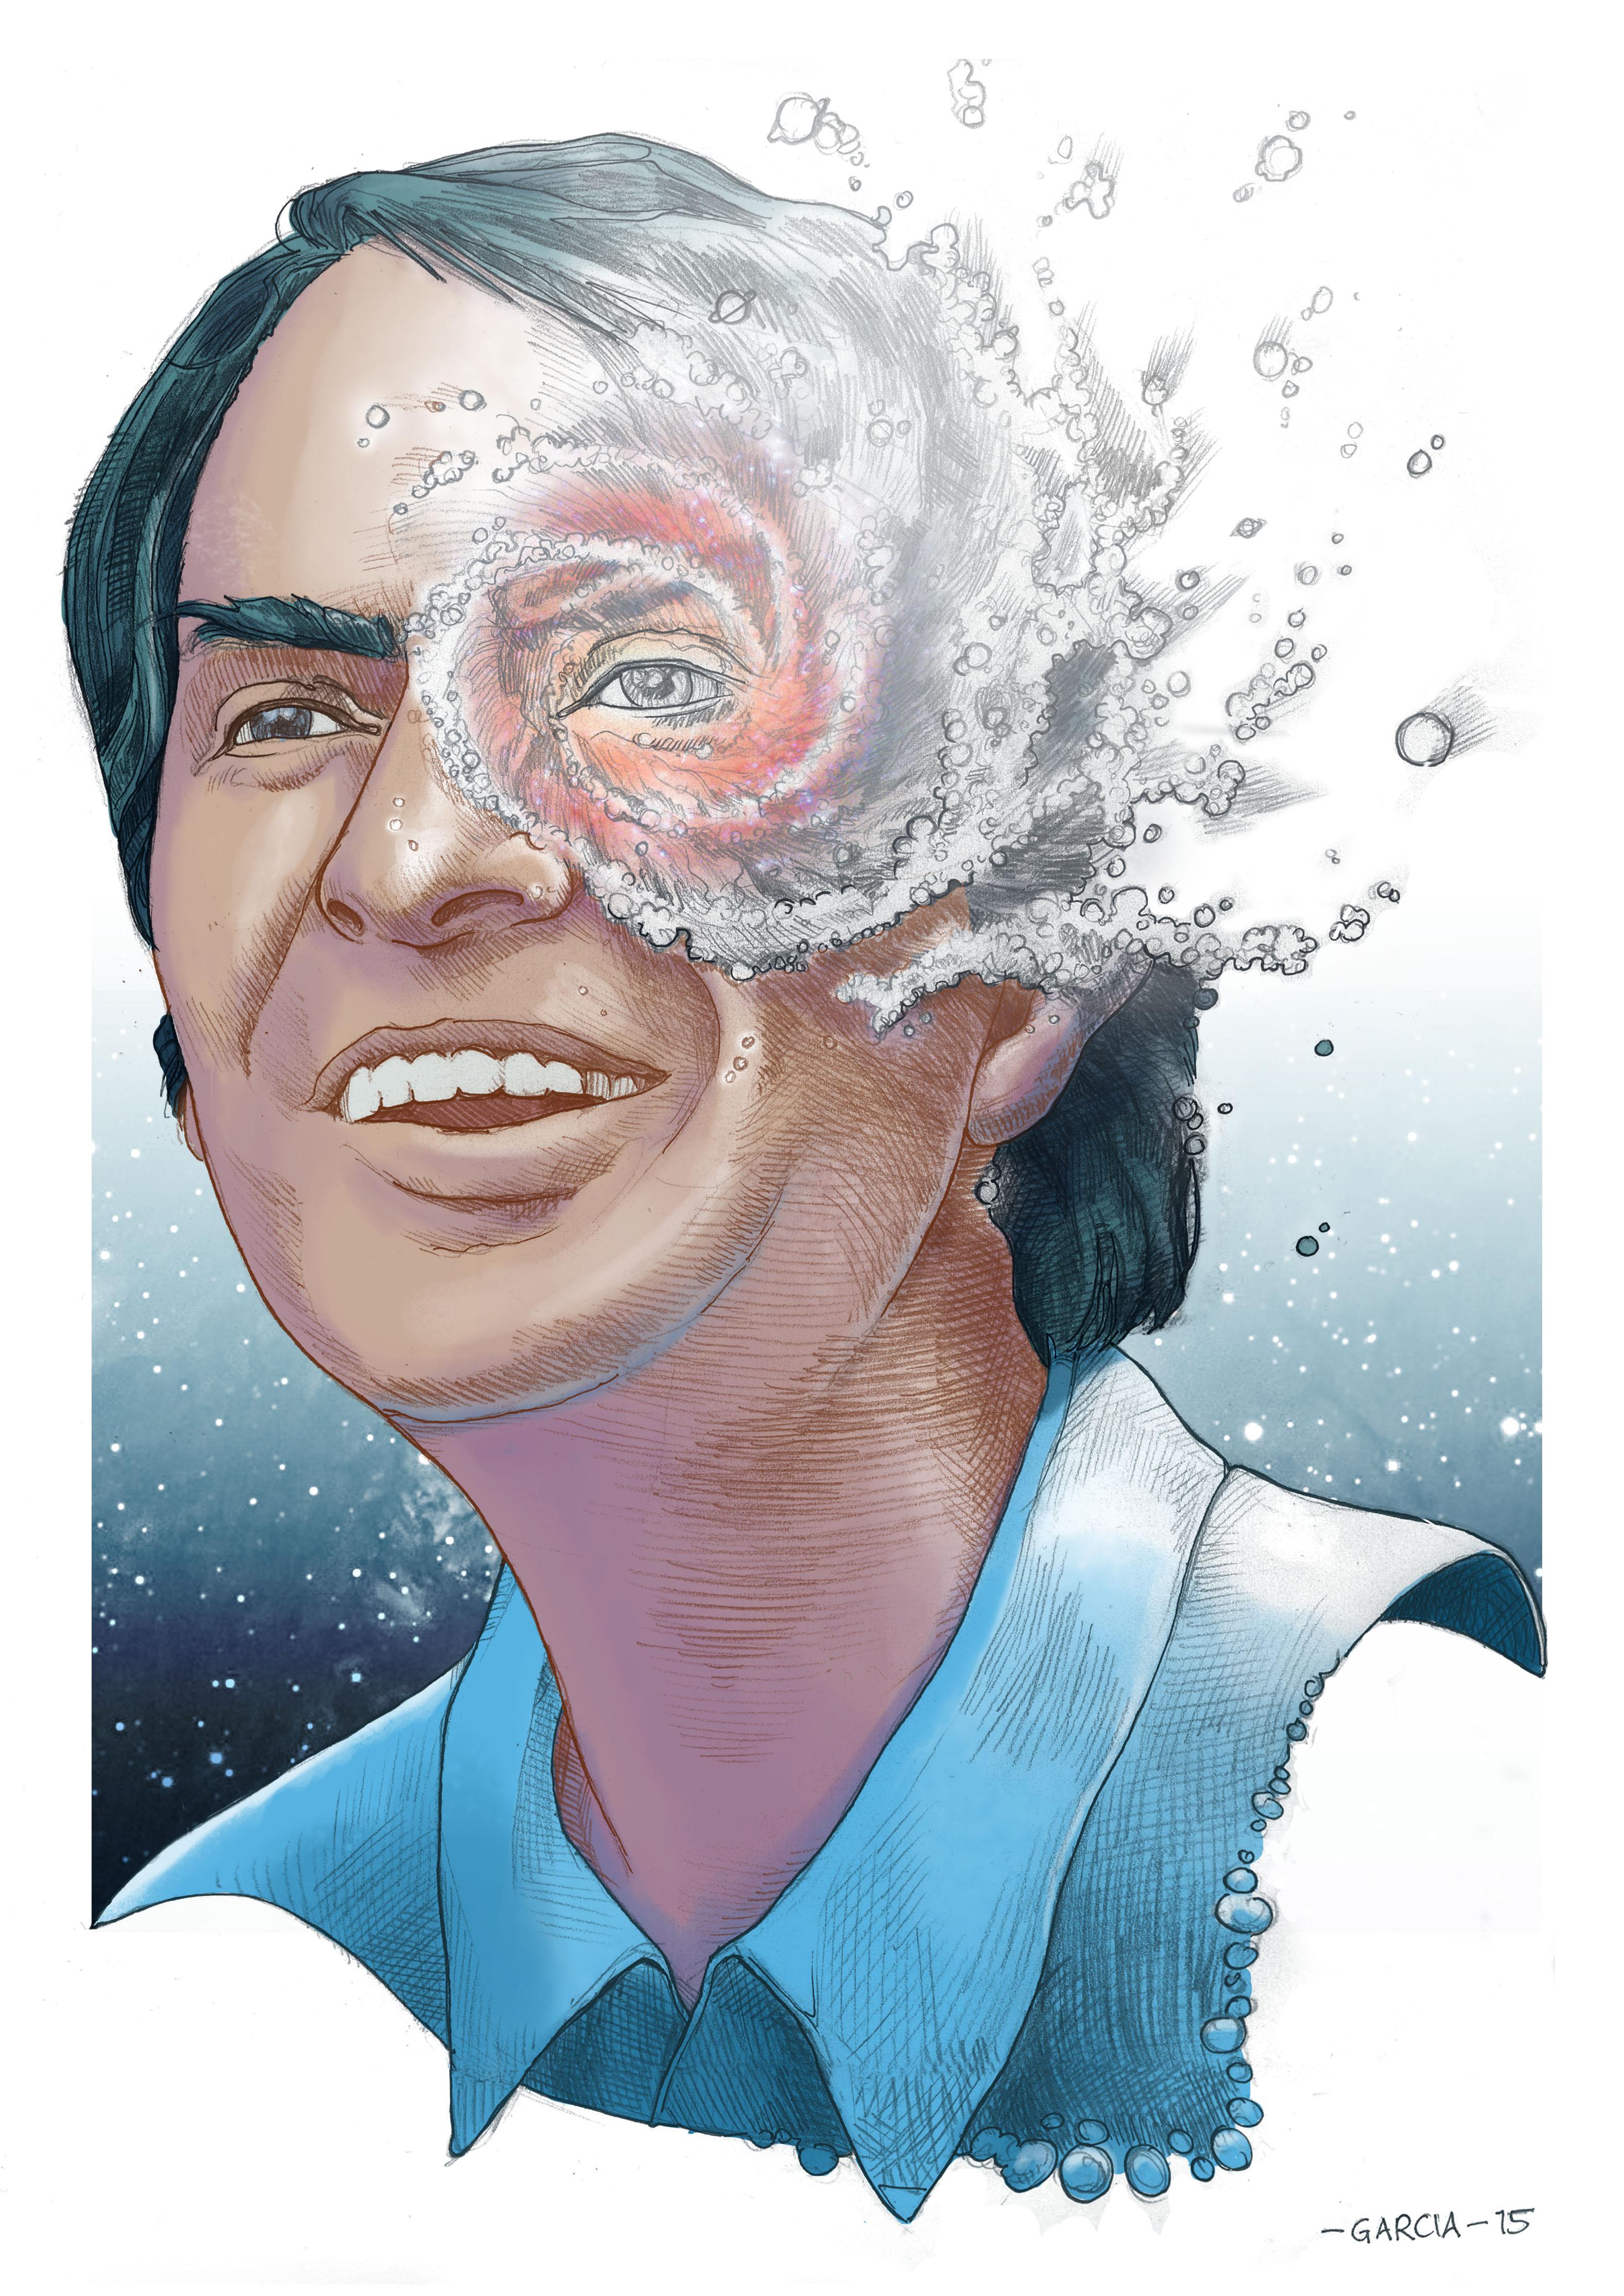 Daniel Garcia Art Illustration Carl Sagan Cosmos Universe 01